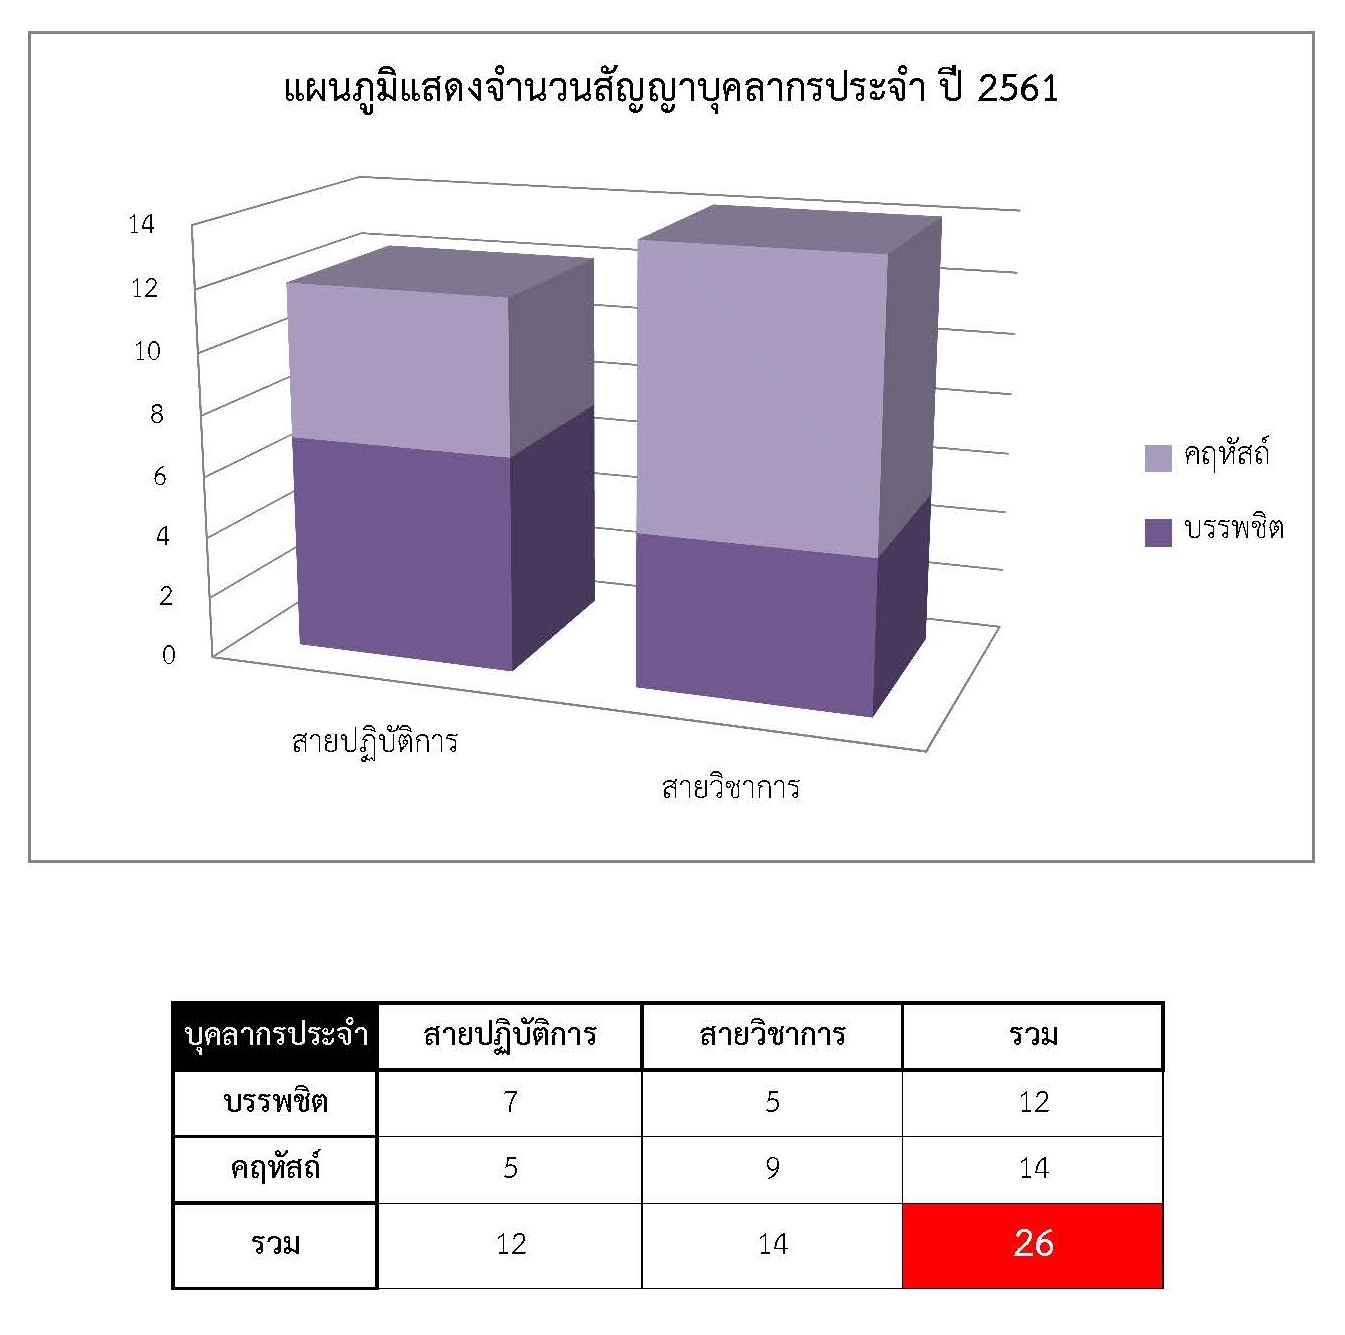 %e0%b8%9b%e0%b8%a3%e0%b8%b0%e0%b8%88%e0%b8%b3-61